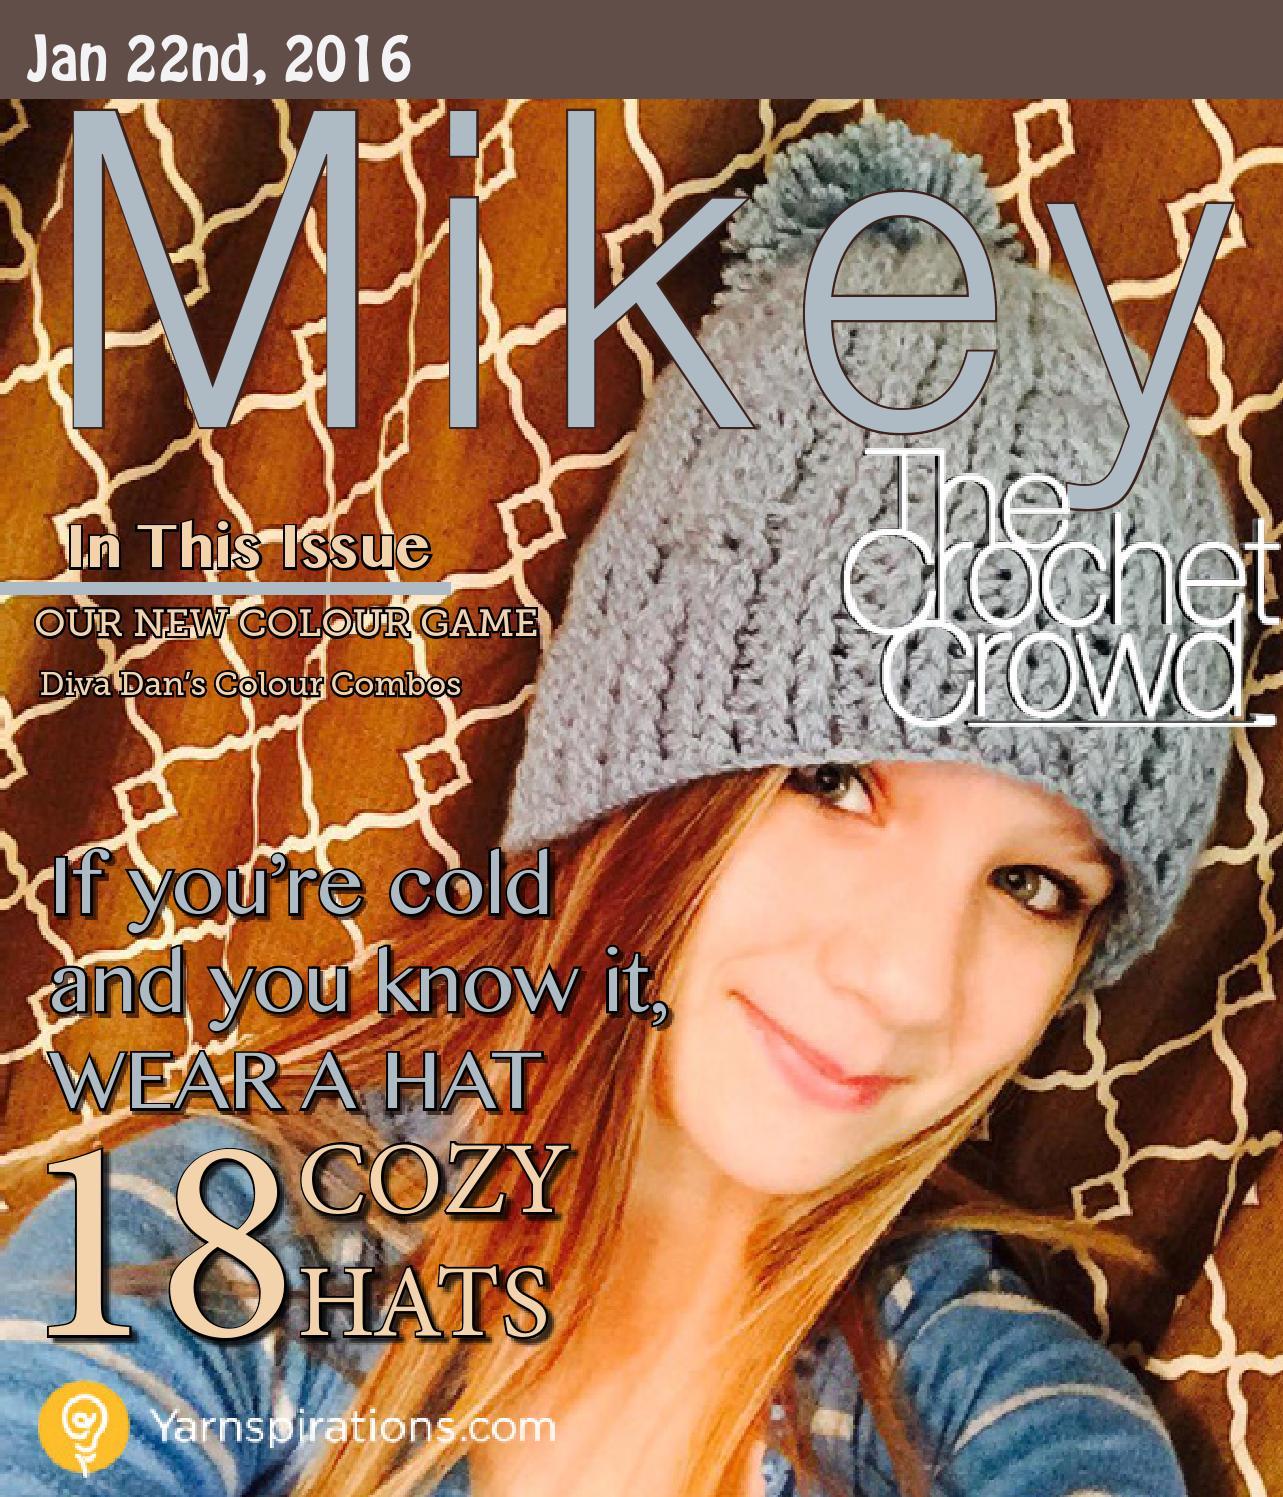 Mikey Magazine: Jan 22, 2016 by The Crochet Crowd - issuu